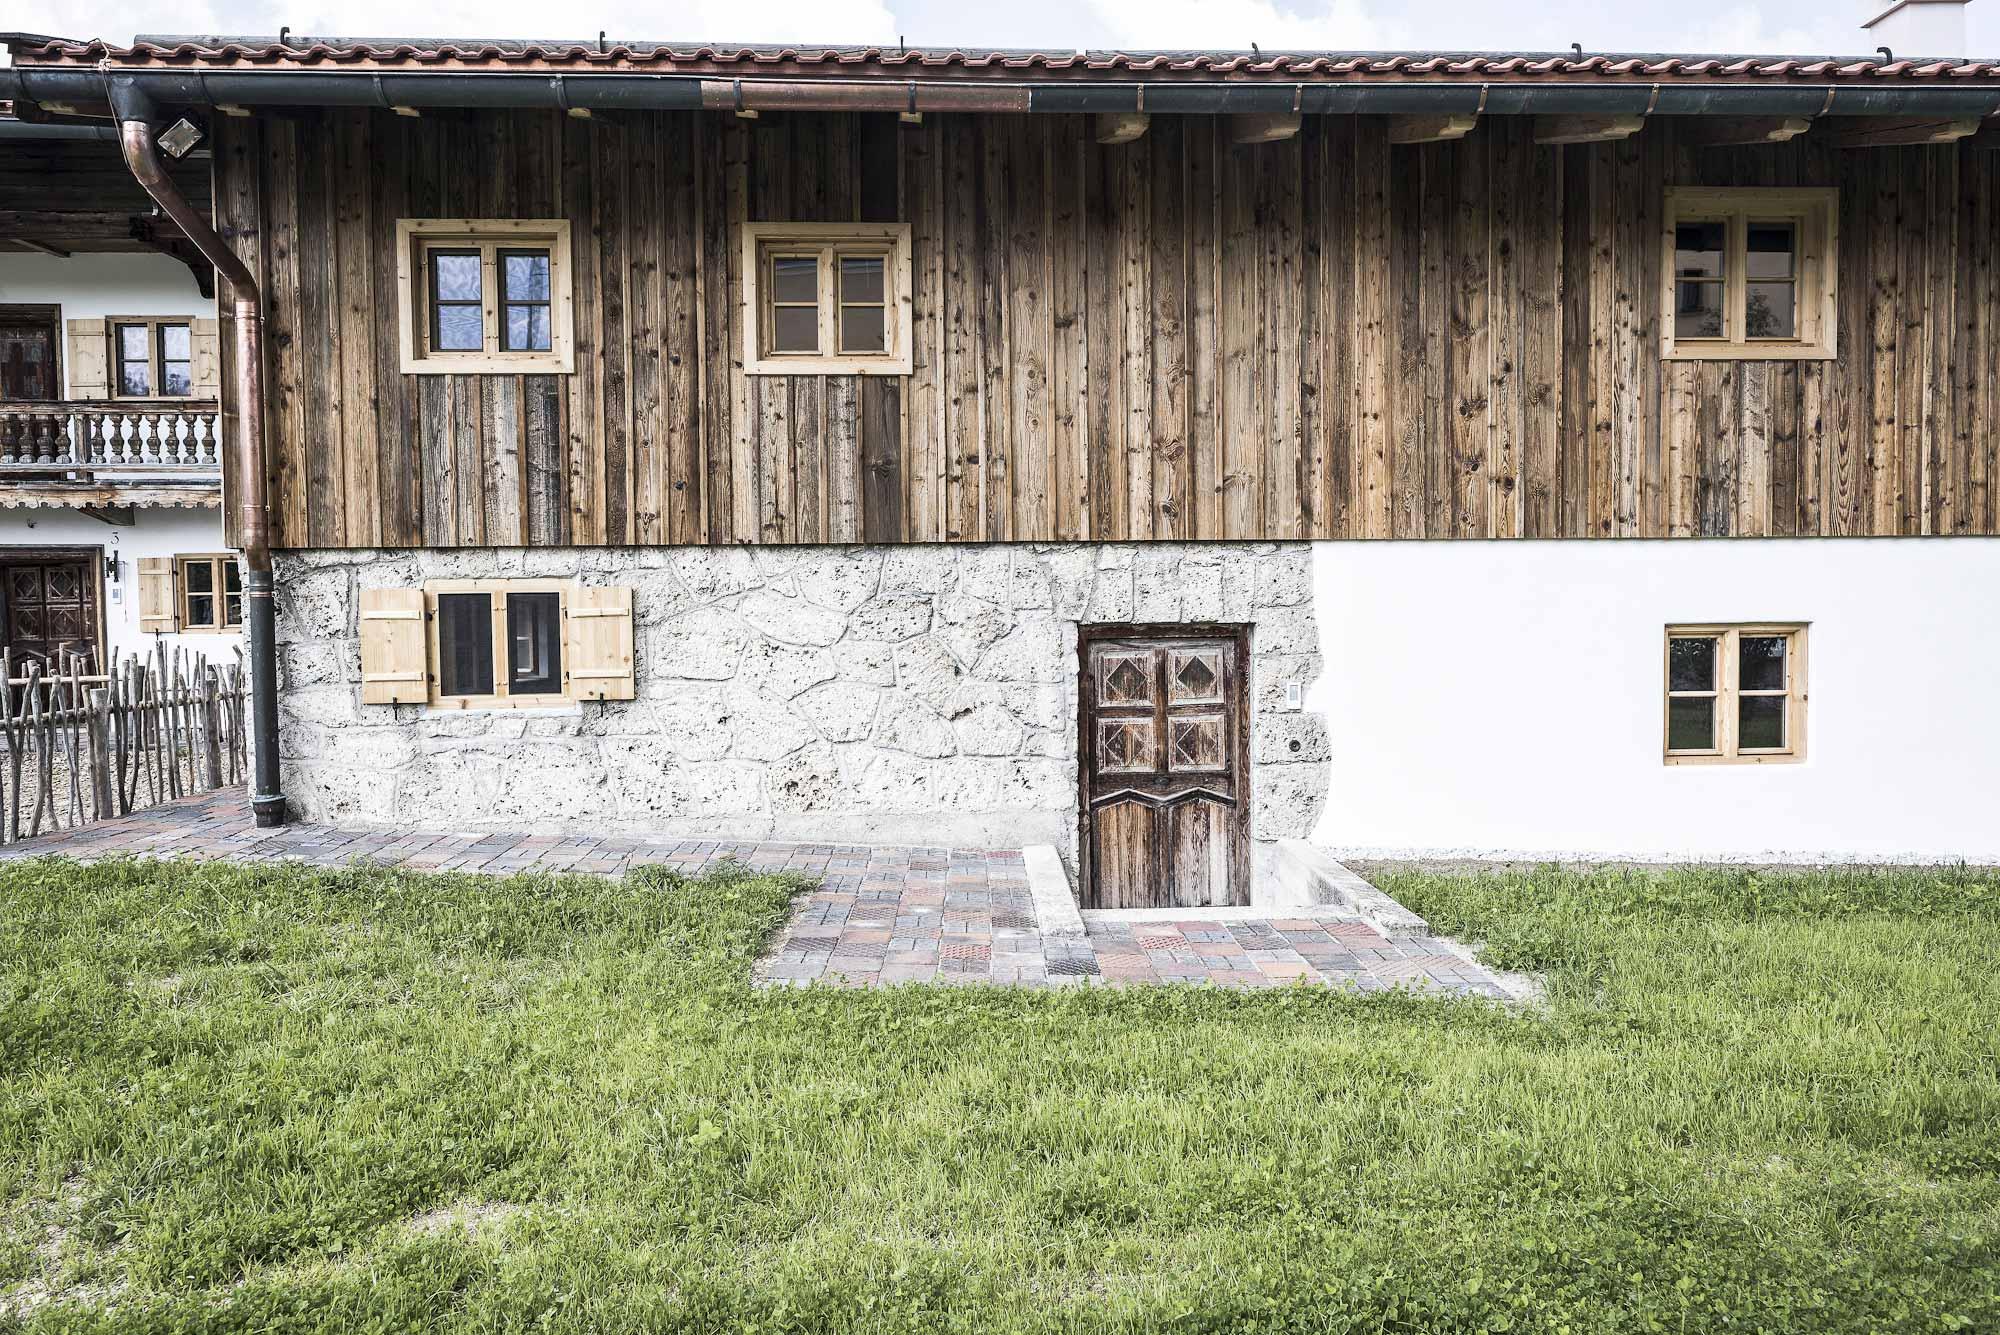 zimmerei-stoib-holzbau-sanierung-hof-umbau-altholz-innenausbau-festsaal-28.jpg